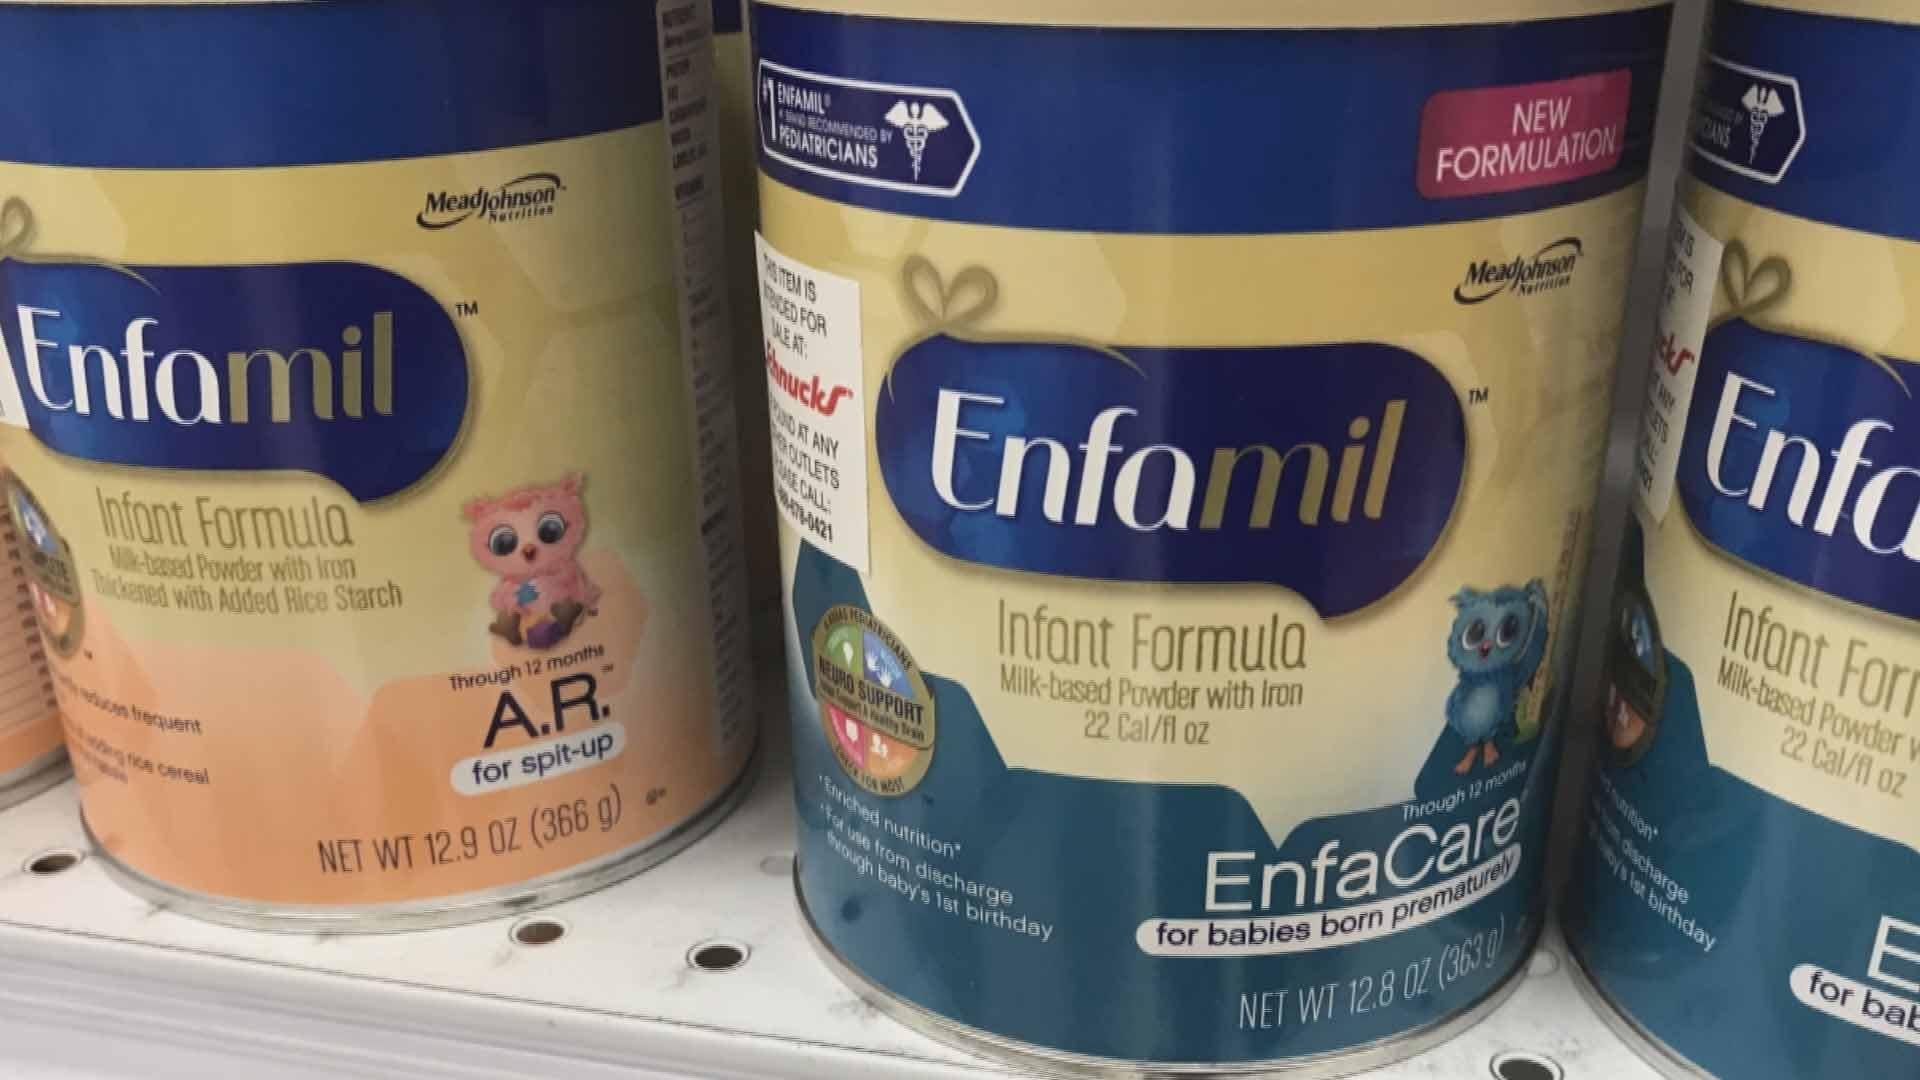 Baby formula. Credit: KMOV